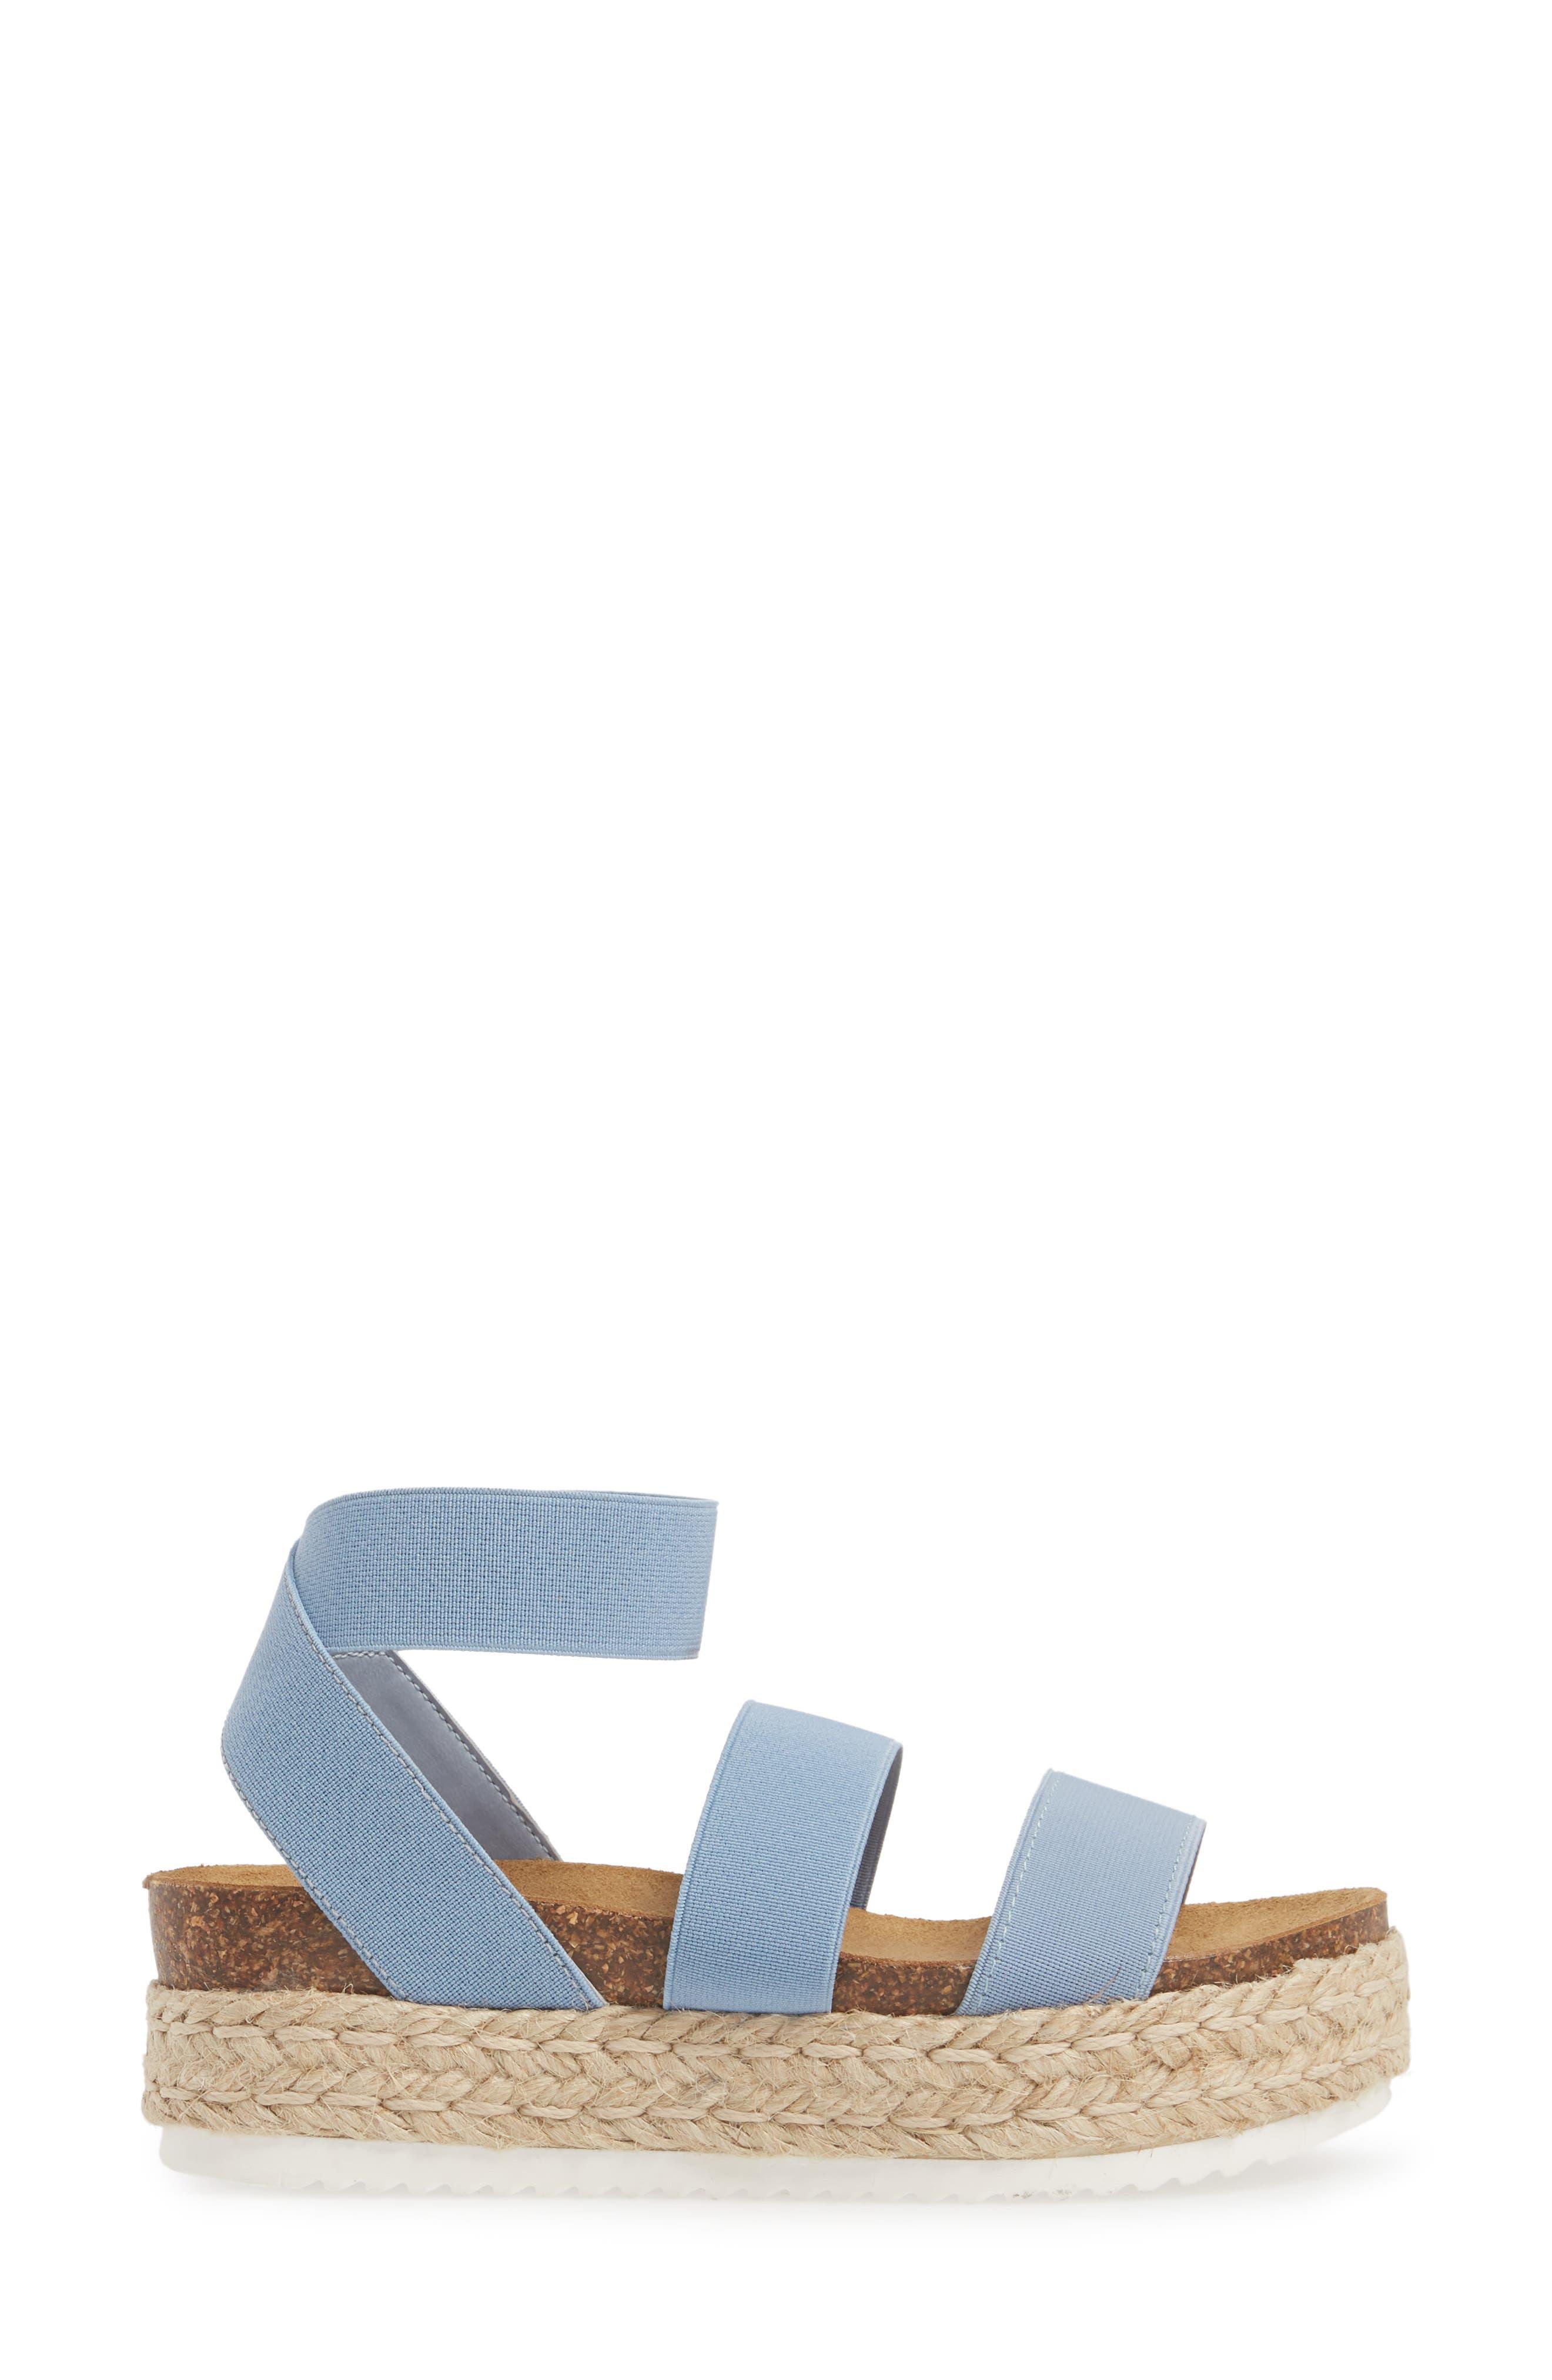 Kimmie Flatform Sandal,                             Alternate thumbnail 3, color,                             Blue